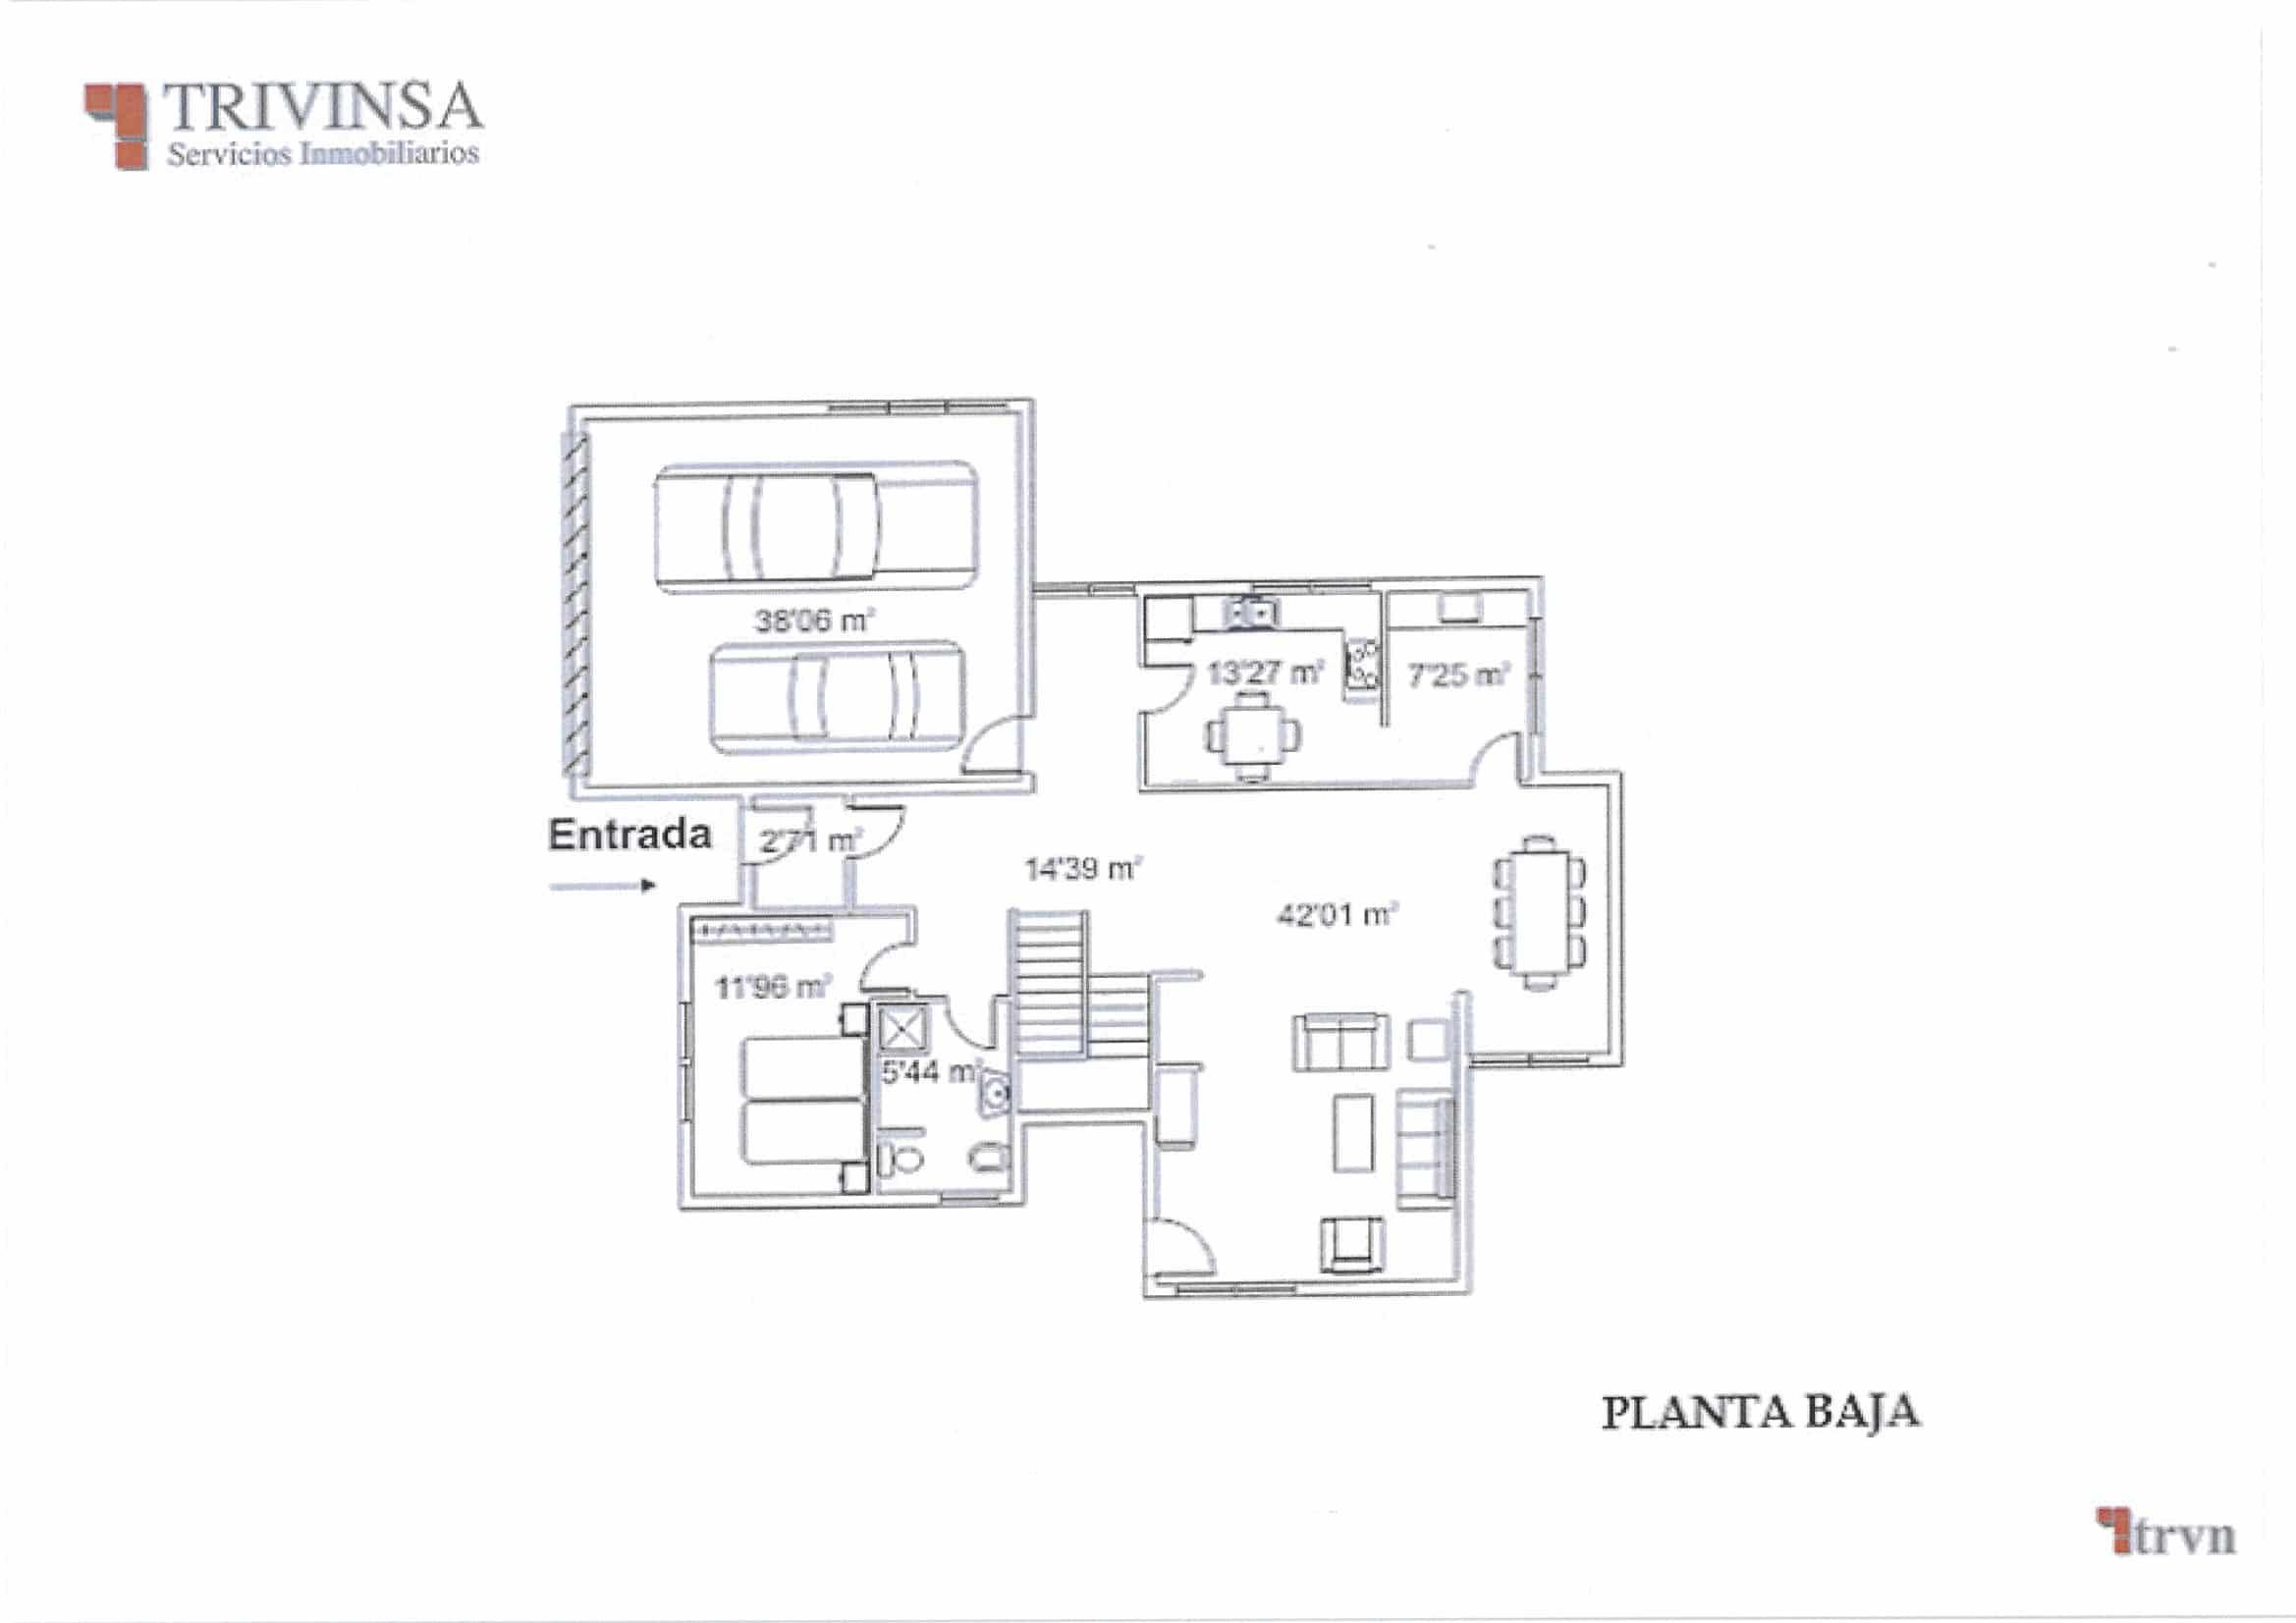 C03544-COTAS PLANTA BAJA